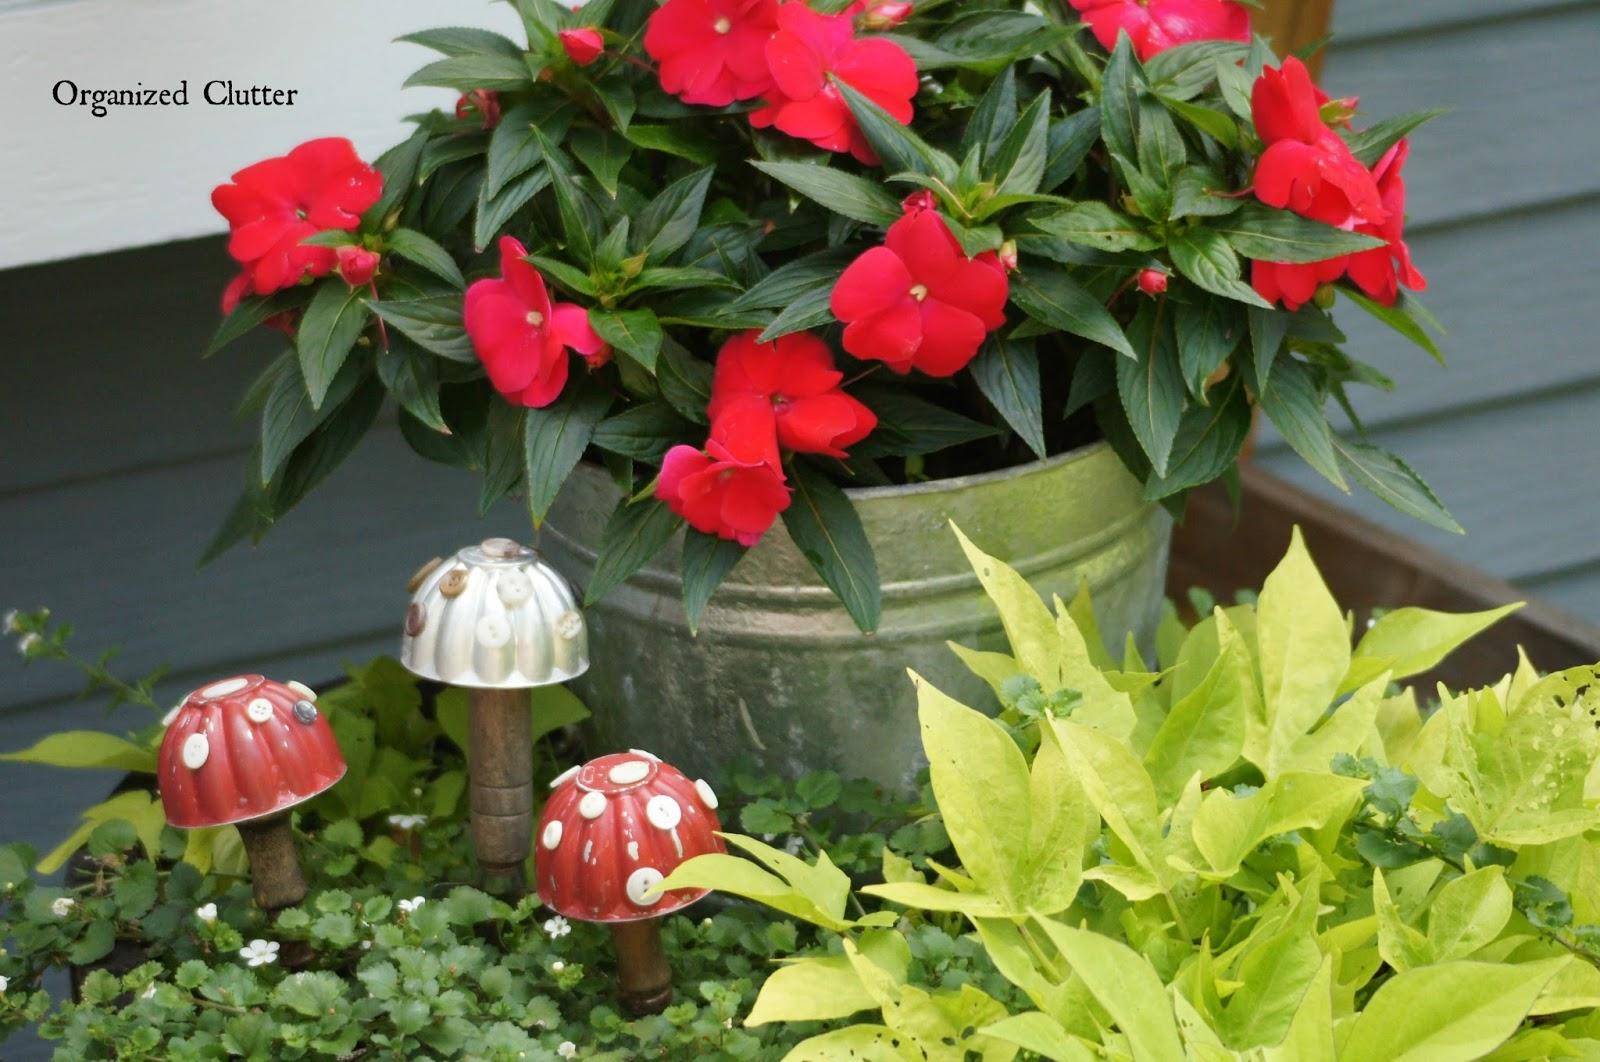 Sun Patiens and Jello Mold Toadstools www.organizedclutterqueen.blogspot.com